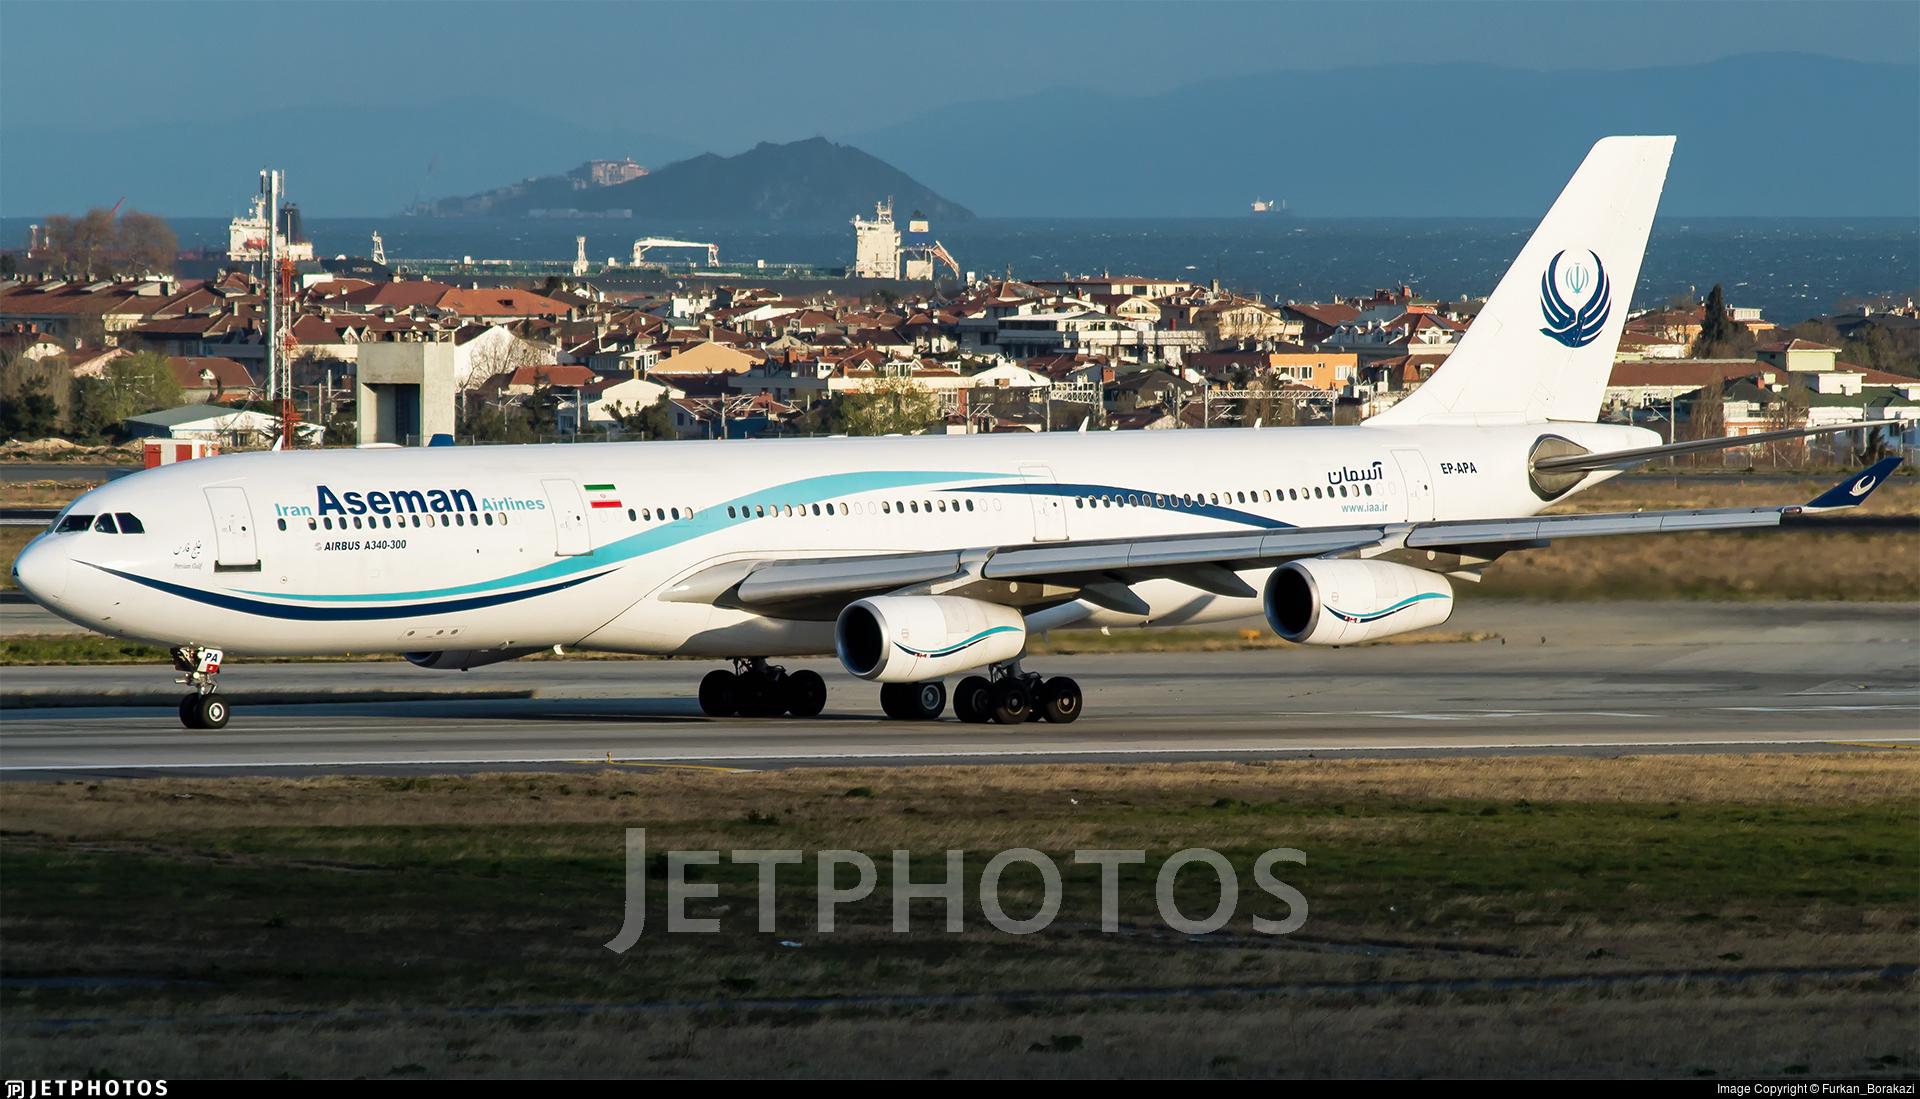 EP-APA - Airbus A340-311 - Iran Aseman Airlines